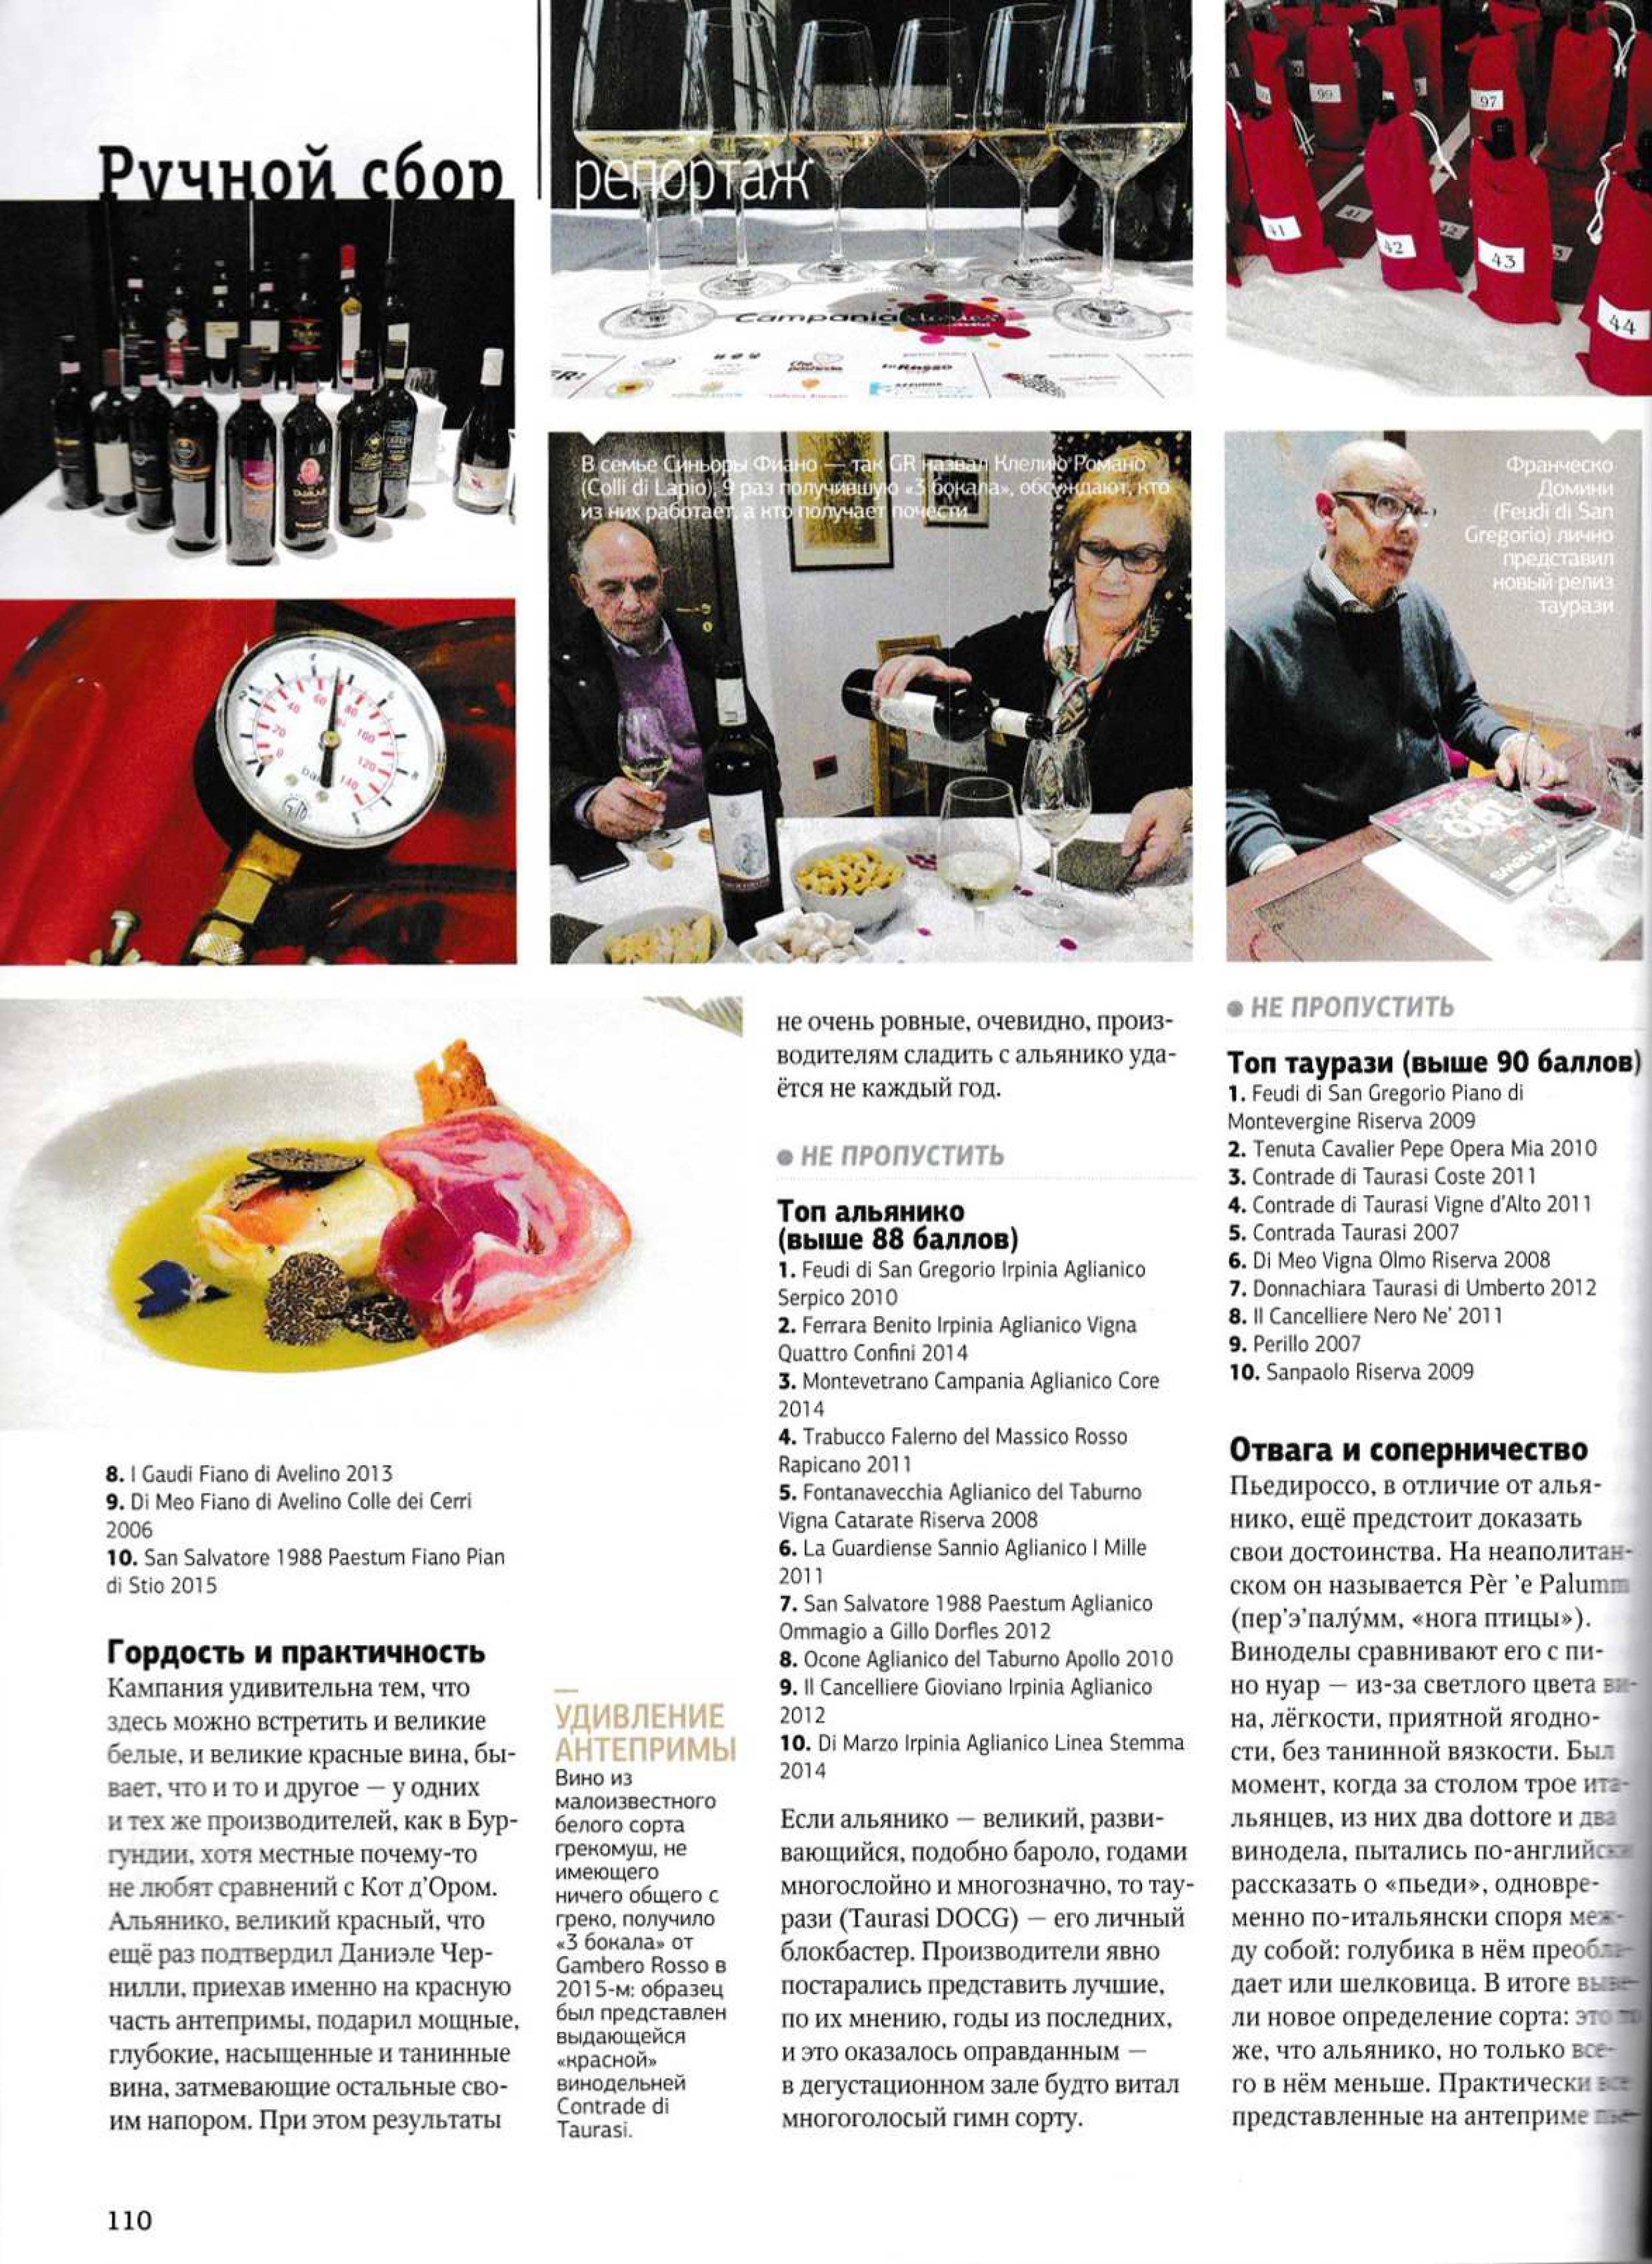 Simple Wine News Russia